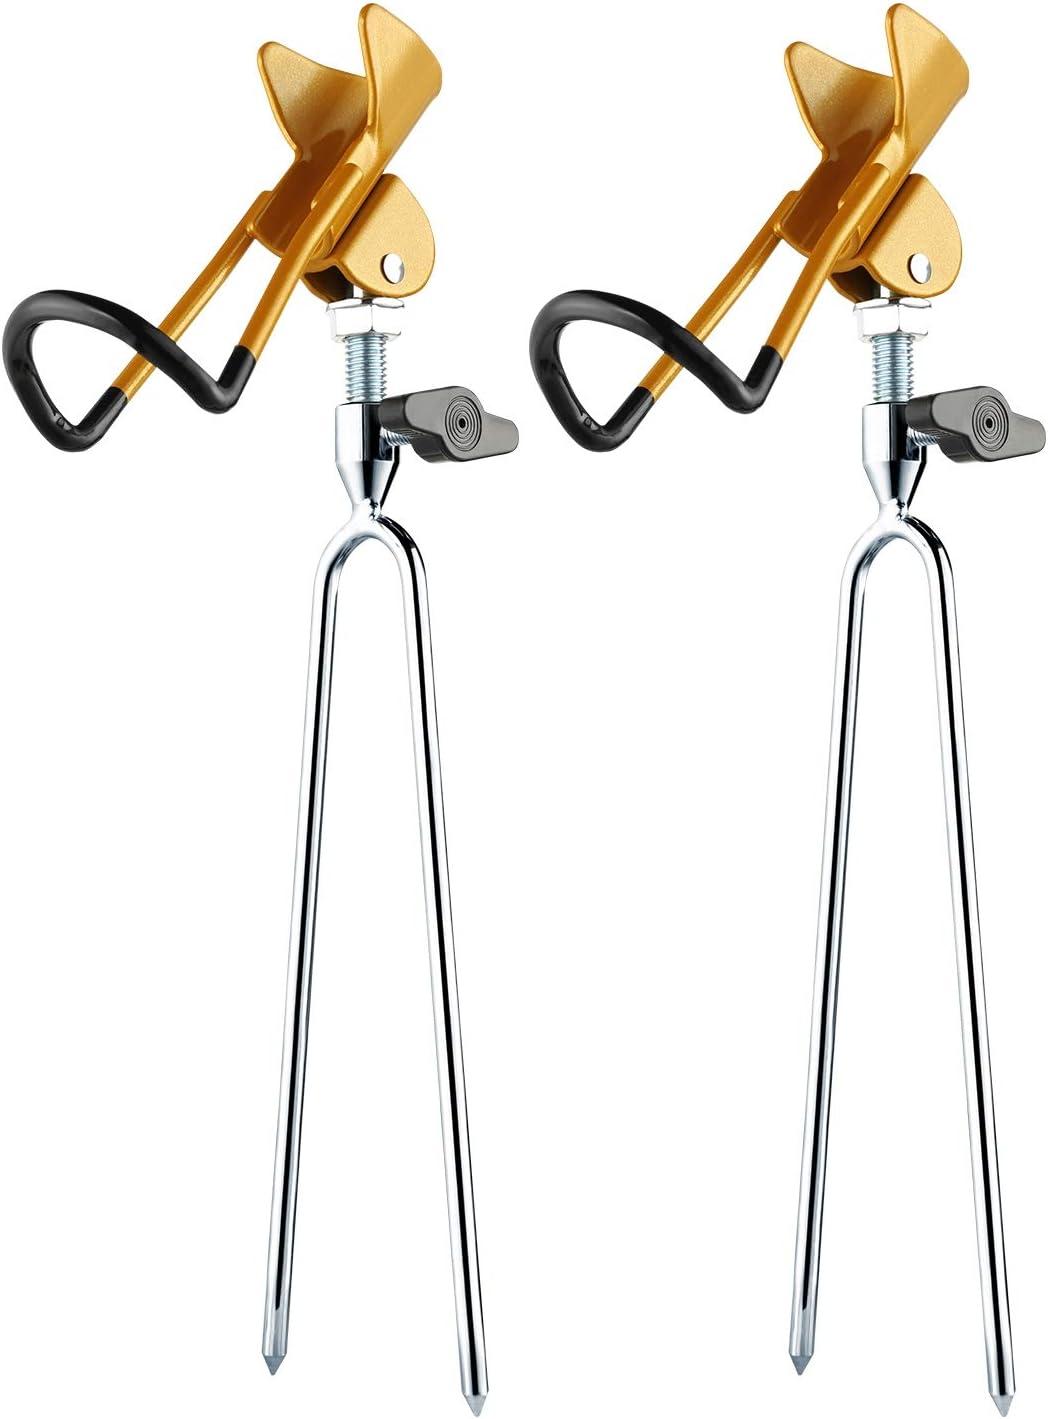 Rodeel 2Pcs Bank Fishing Rod Holder,Detachable Pole Stand Rack,River Beach Lake Fishing,Sand Soil Dirt